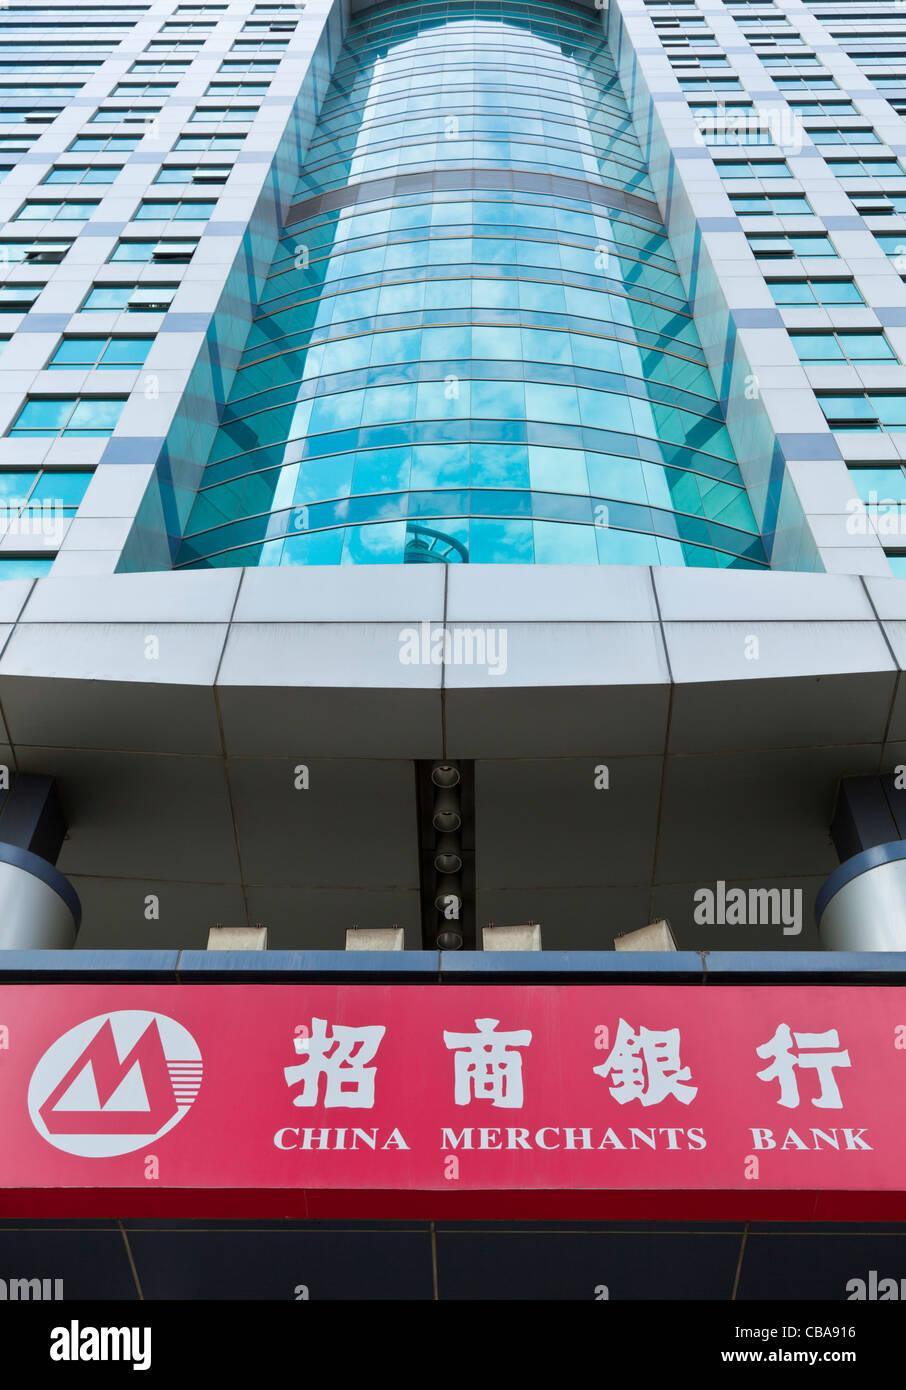 China Merchants bank building Pudong Shanghai, Peoples Republic of China, PRC, Asia - Stock Image